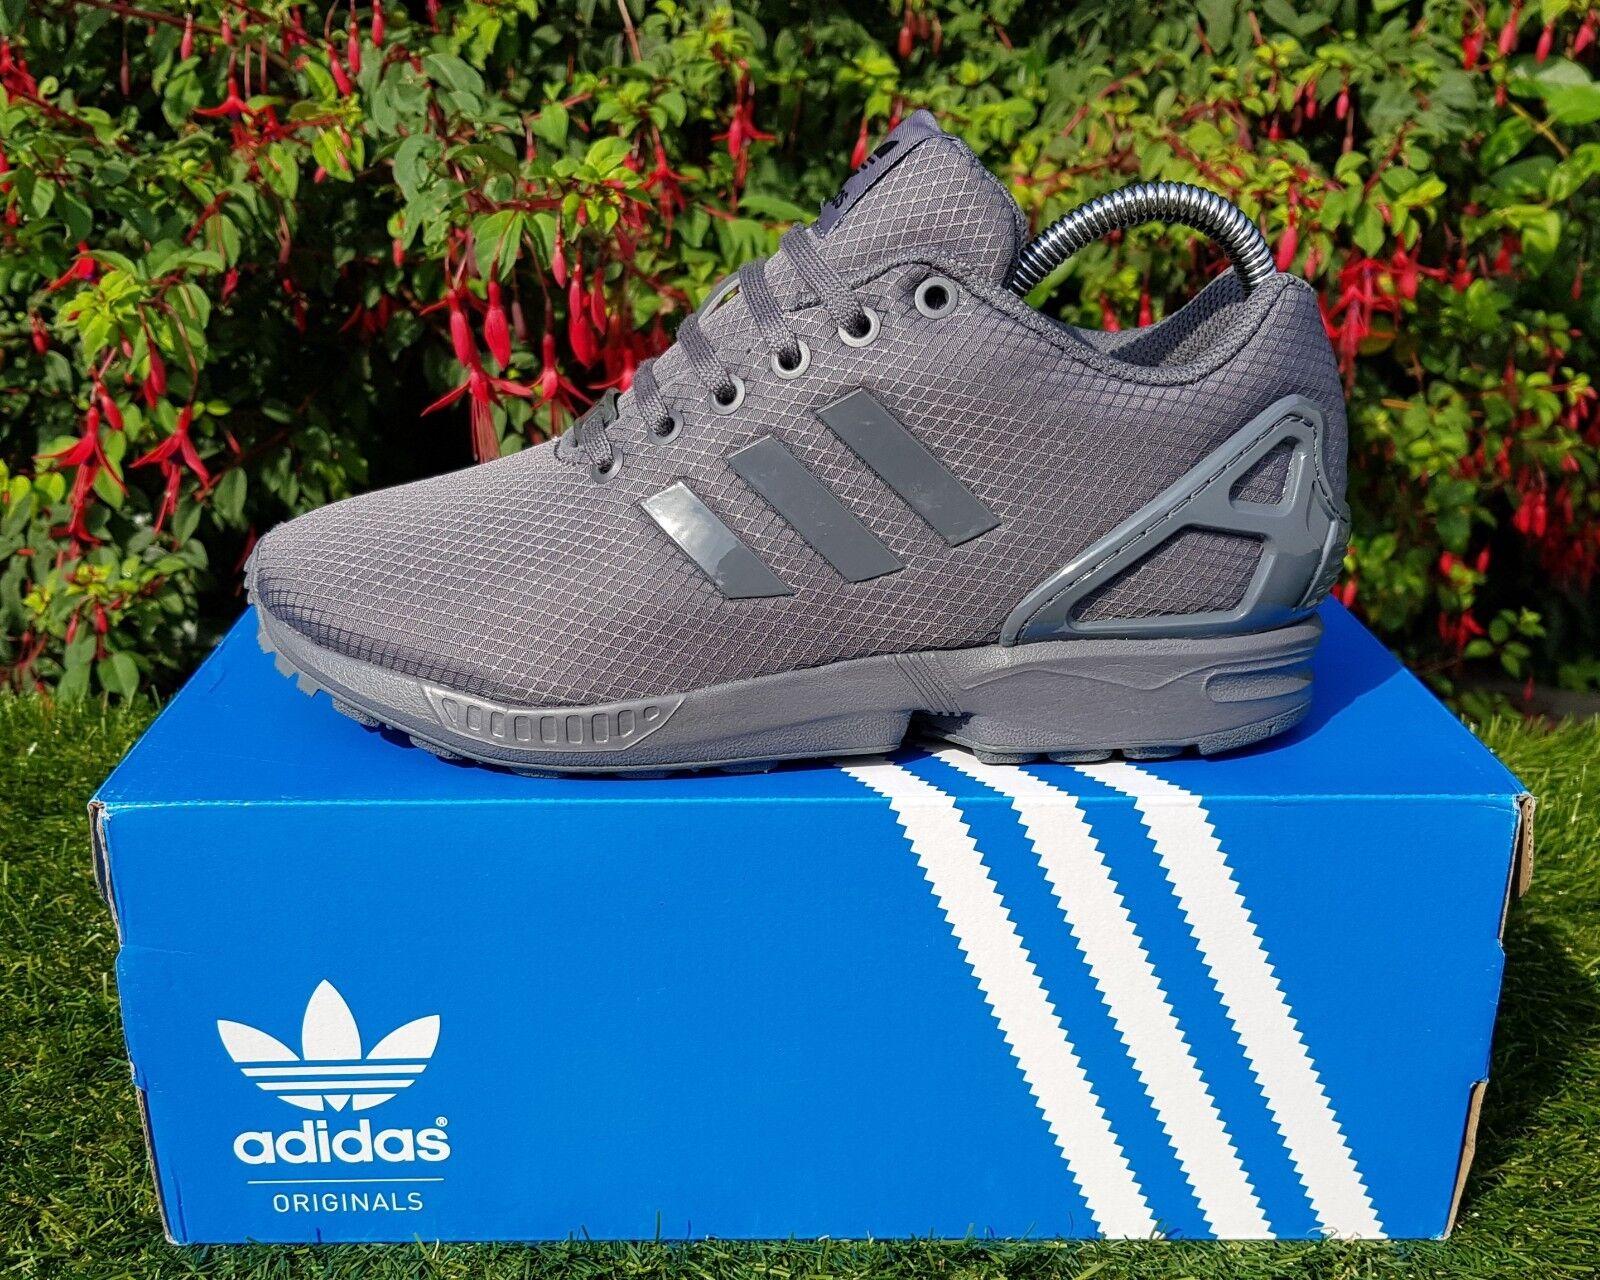 BNWB & Genuine Adidas Originals ZX Flux ® Ripstop Triple Gris Trainers UK